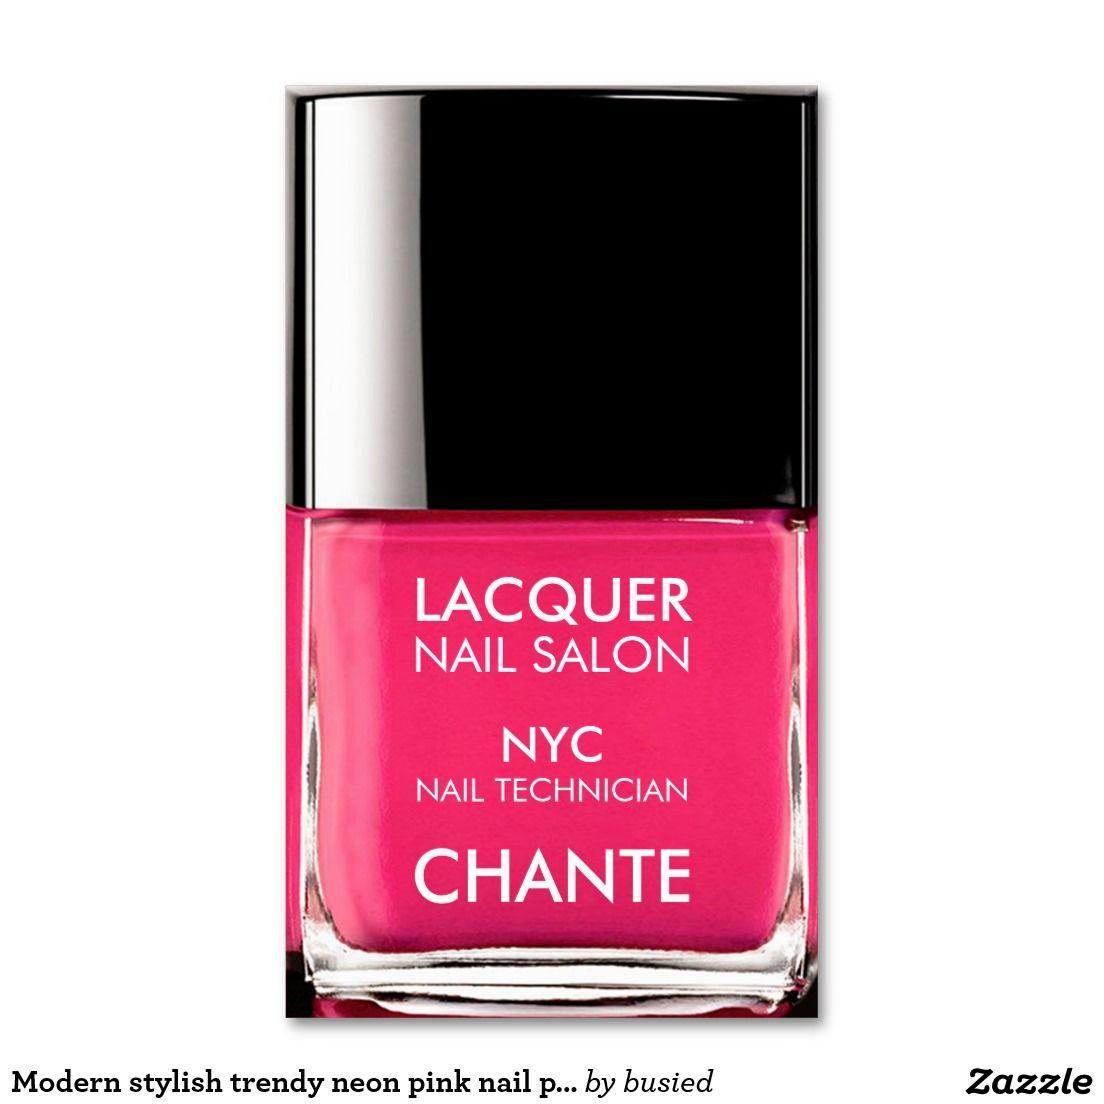 Modern stylish trendy neon pink nail polish chic business card ...